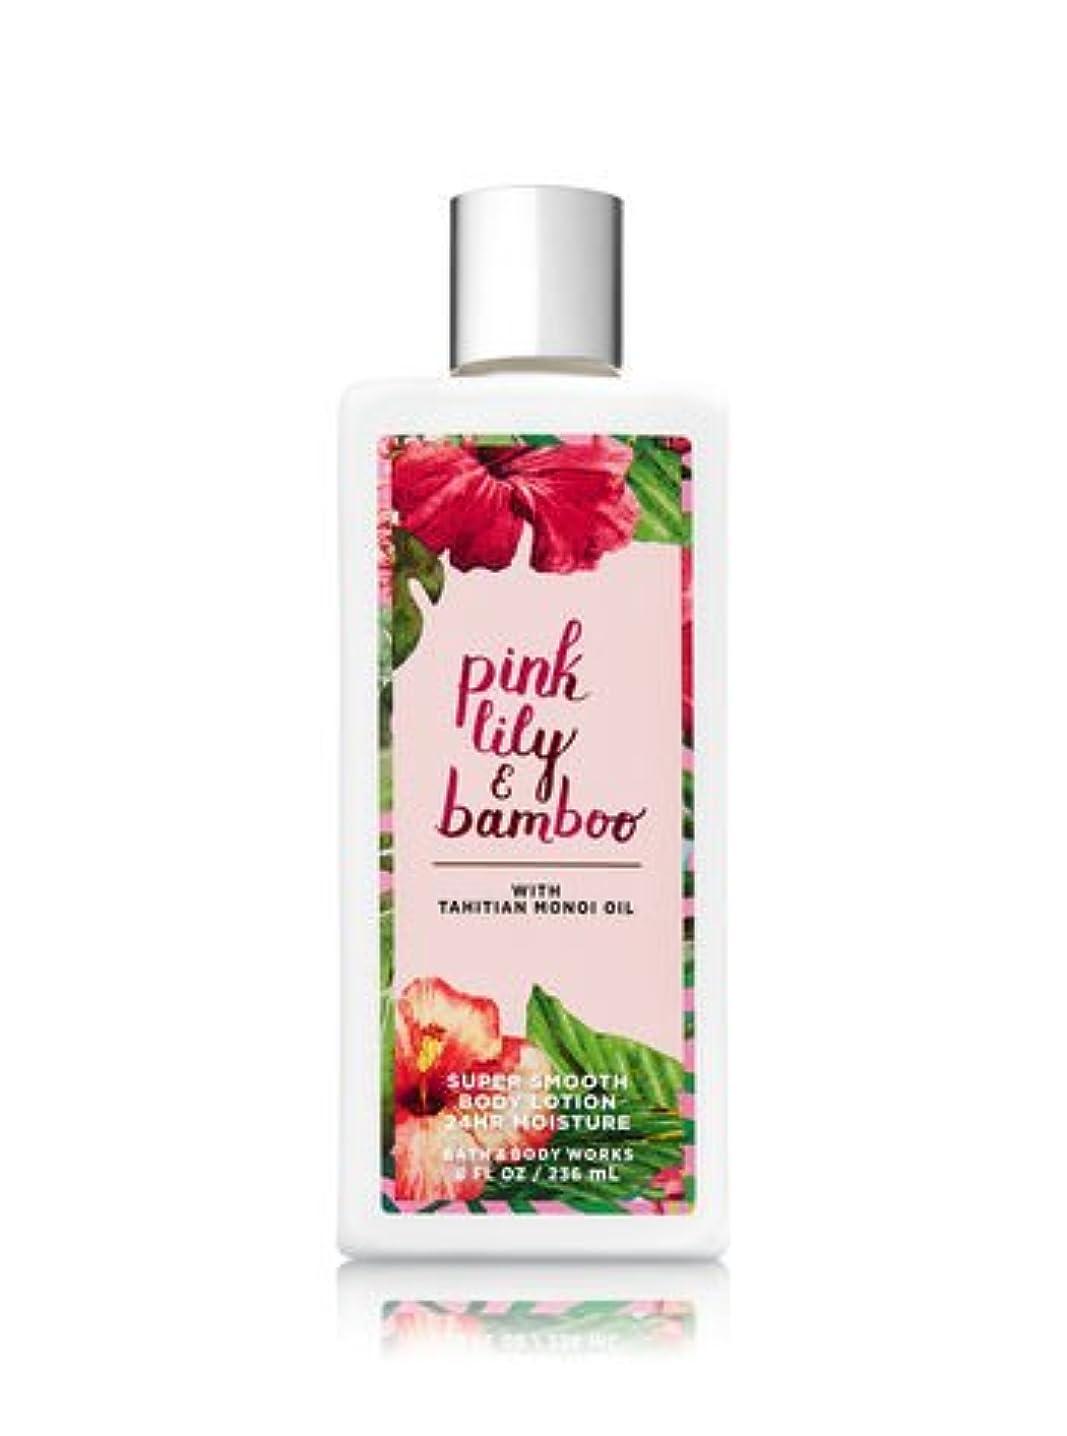 【Bath&Body Works/バス&ボディワークス】 ボディローション ピンクリリー&バンブー Super Smooth Body Lotion Pink Lily & Bamboo 8 fl oz/236 mL [並行輸入品]